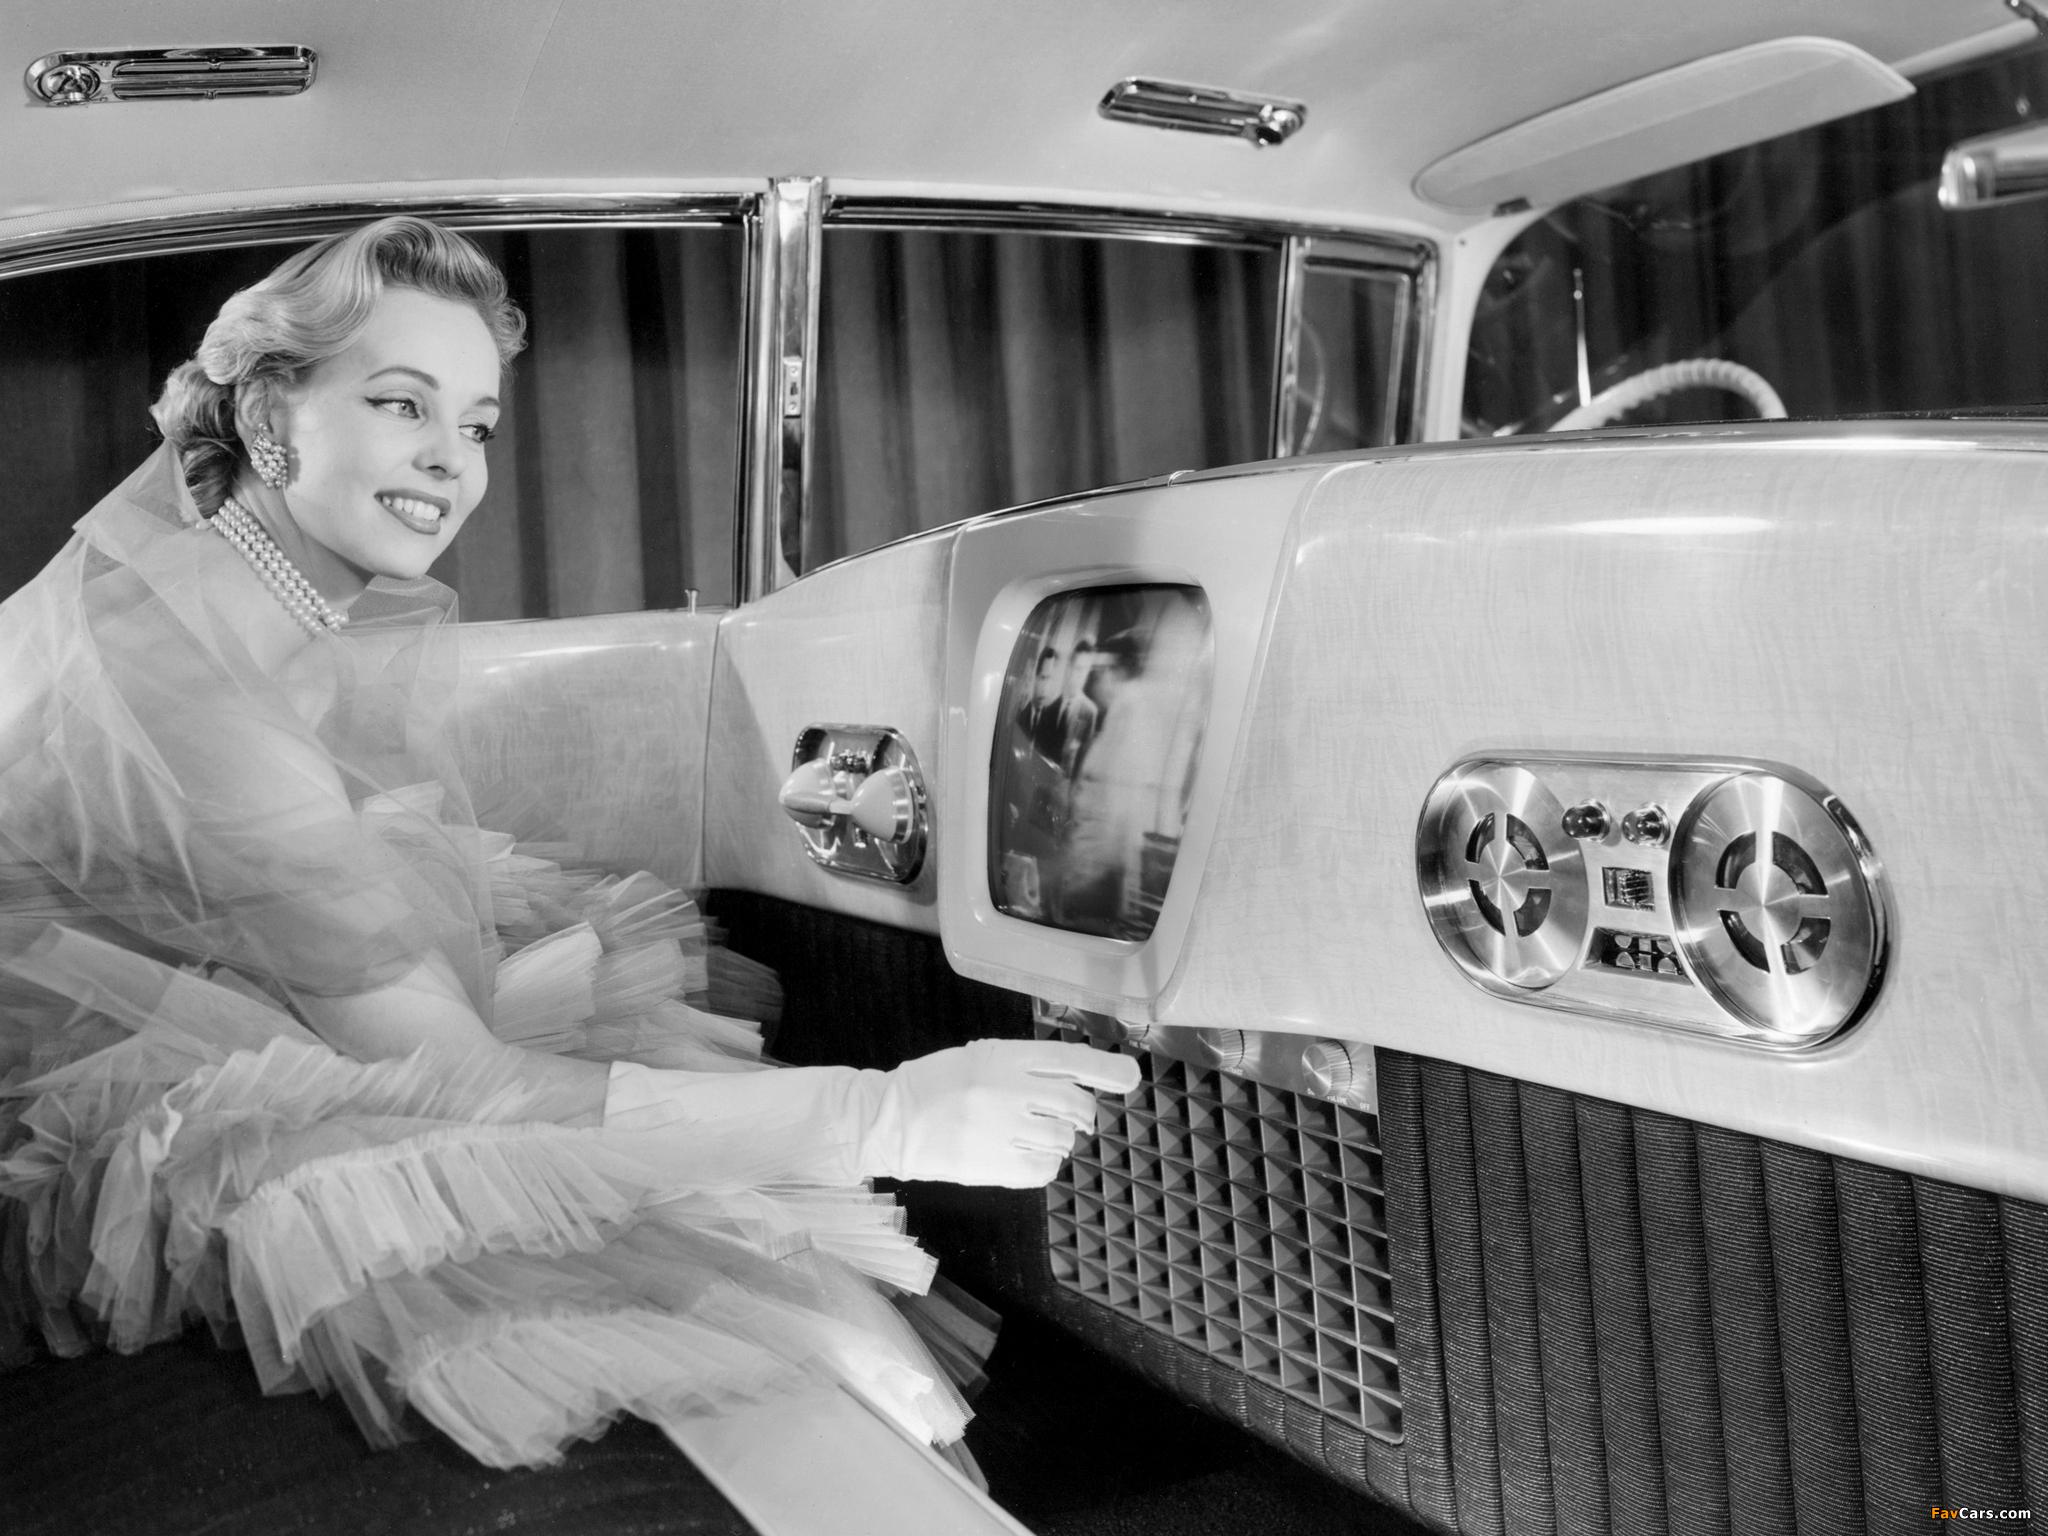 Cadillac Eldorado Brougham Dream Car 1955 wallpapers (2048 x 1536)